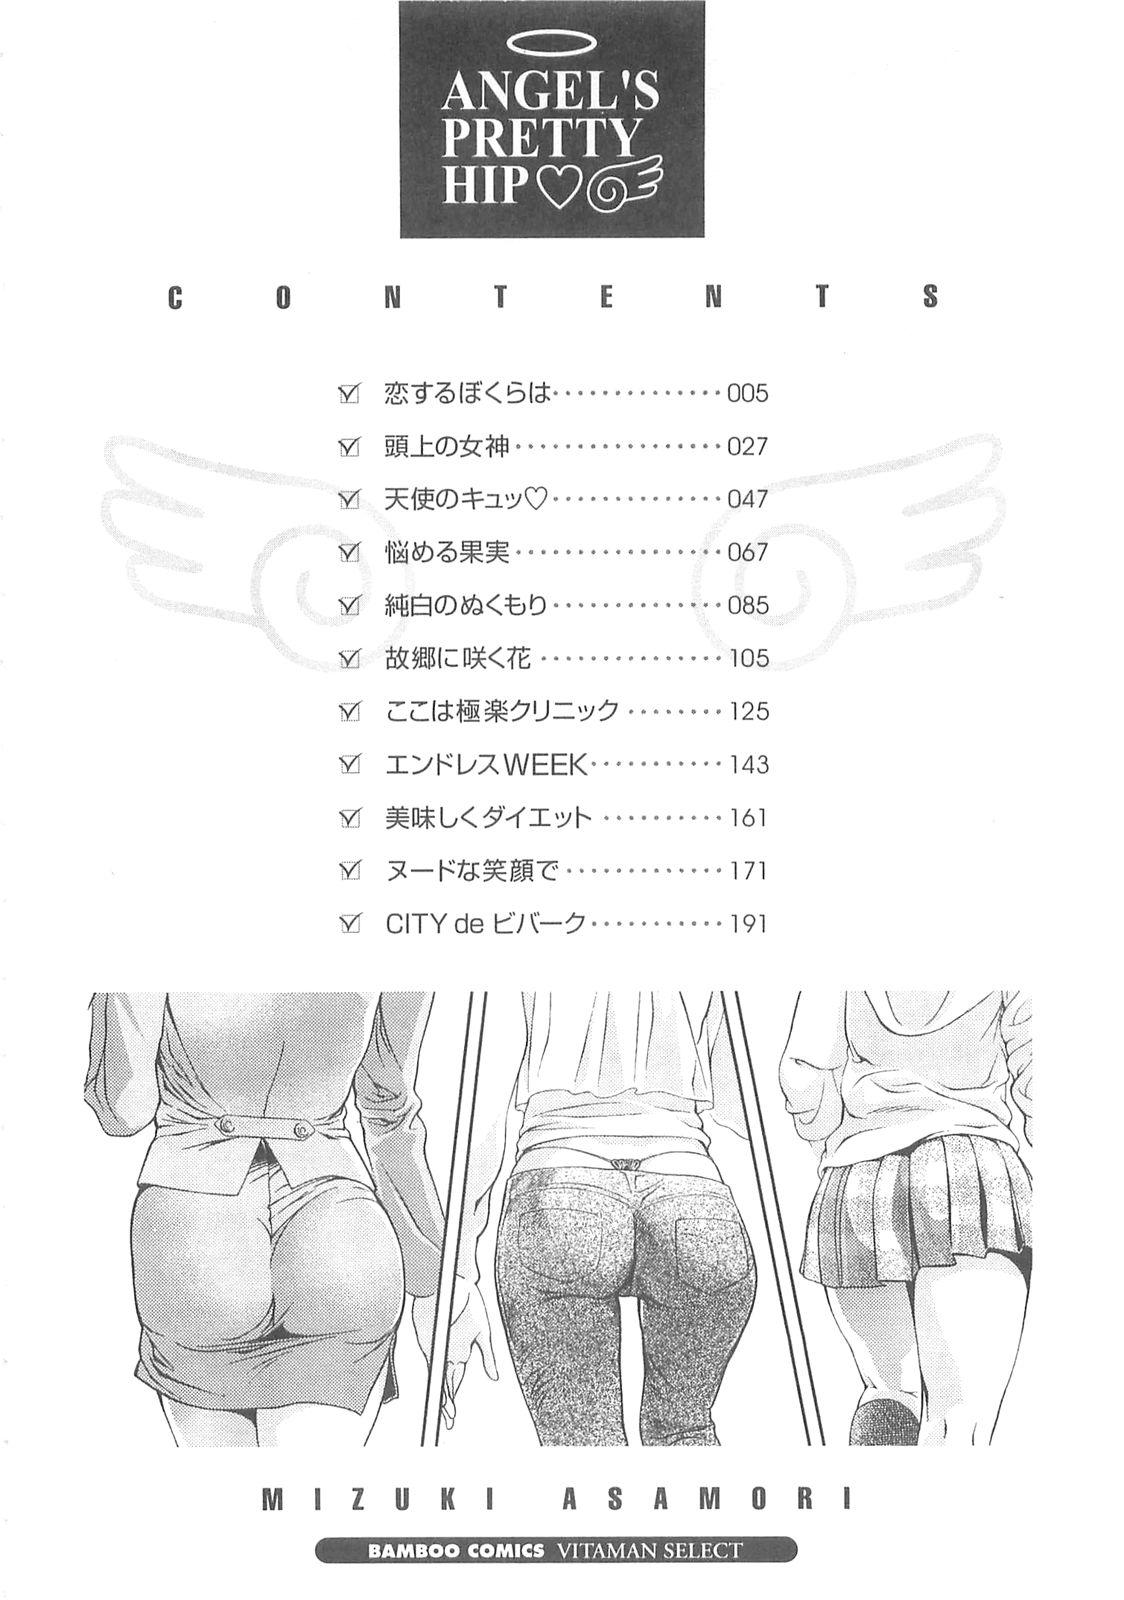 Tenshi no Kyuu - Angel's Pretty Hip 4